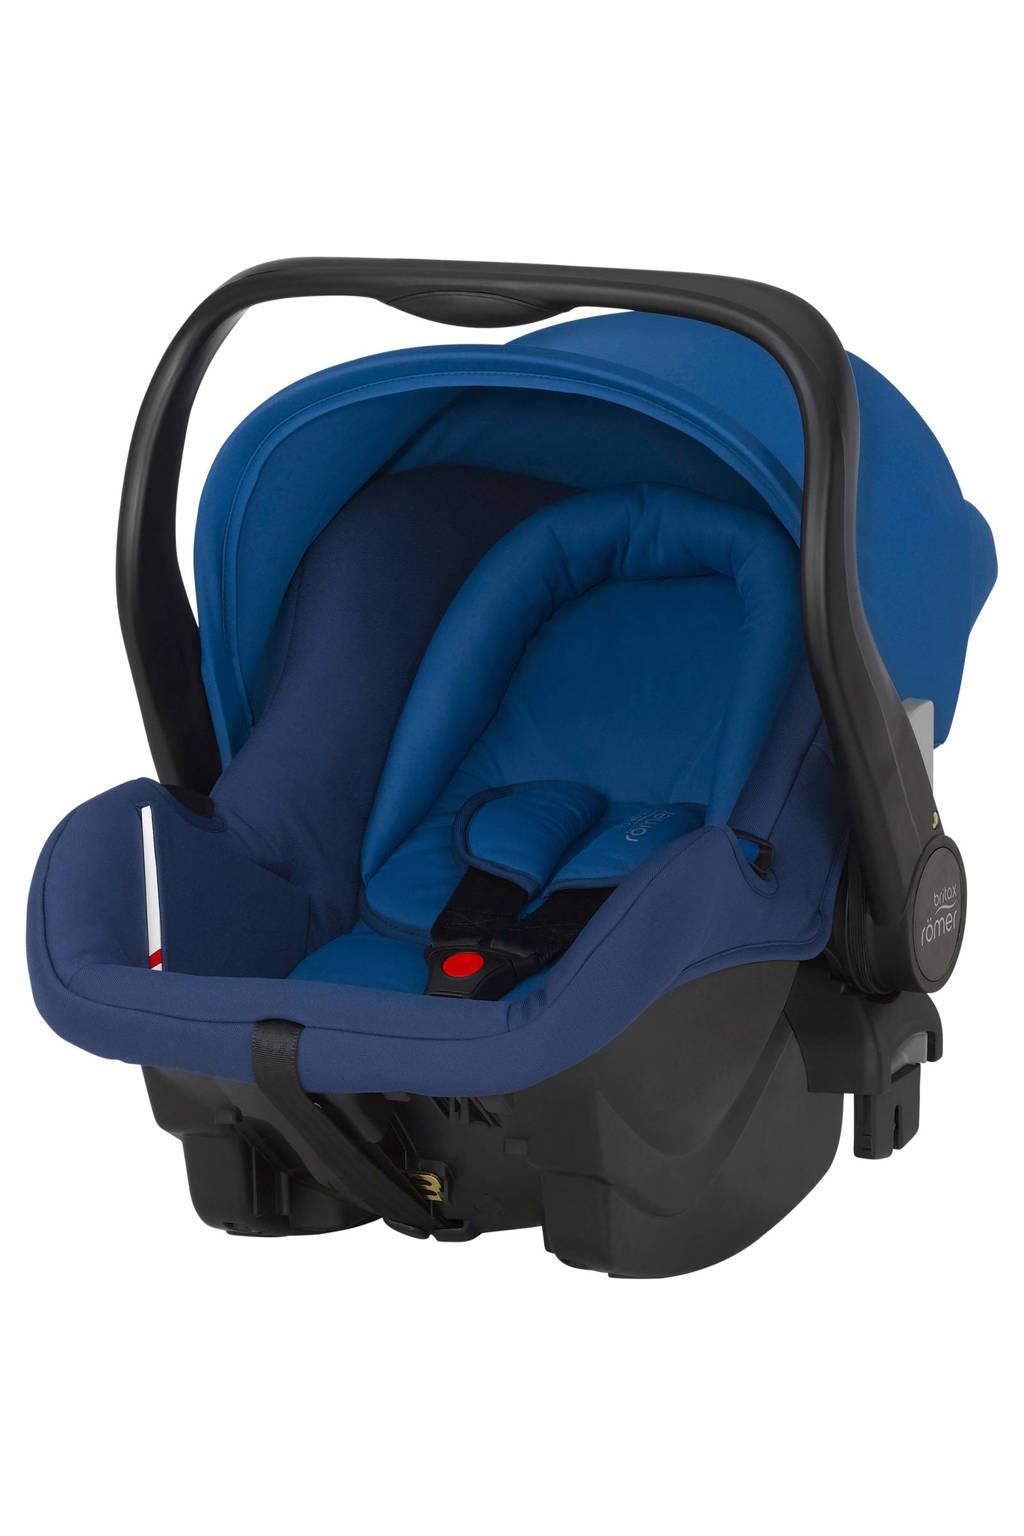 Britax Römer PRIMO BUNDLE autostoel inclusief base ocean blue, Ocean blue